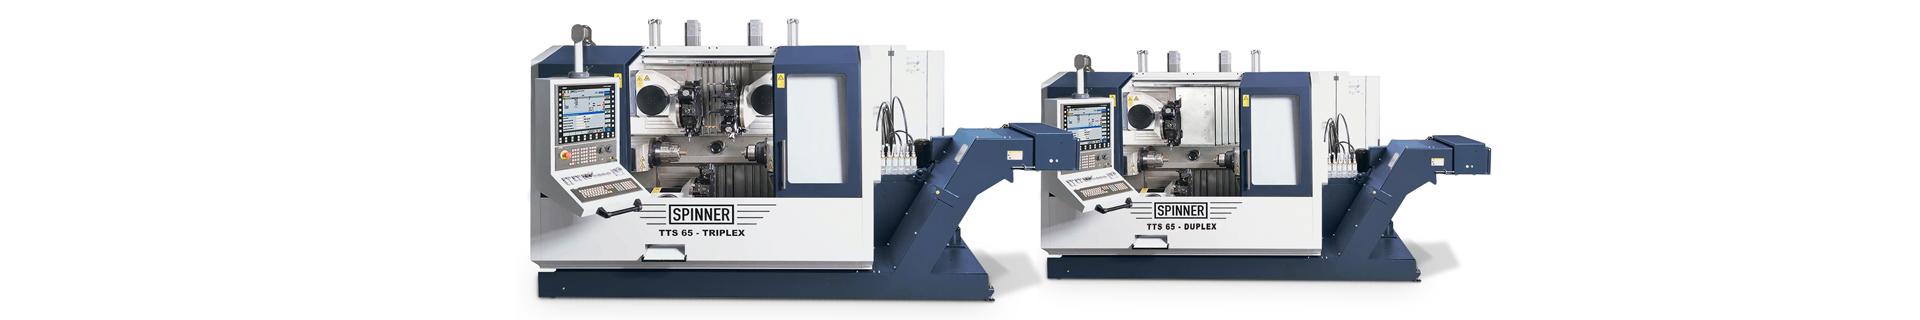 Spinner AG - Hochgeschwindigkeits-Produktionsdrehmaschine - TTS